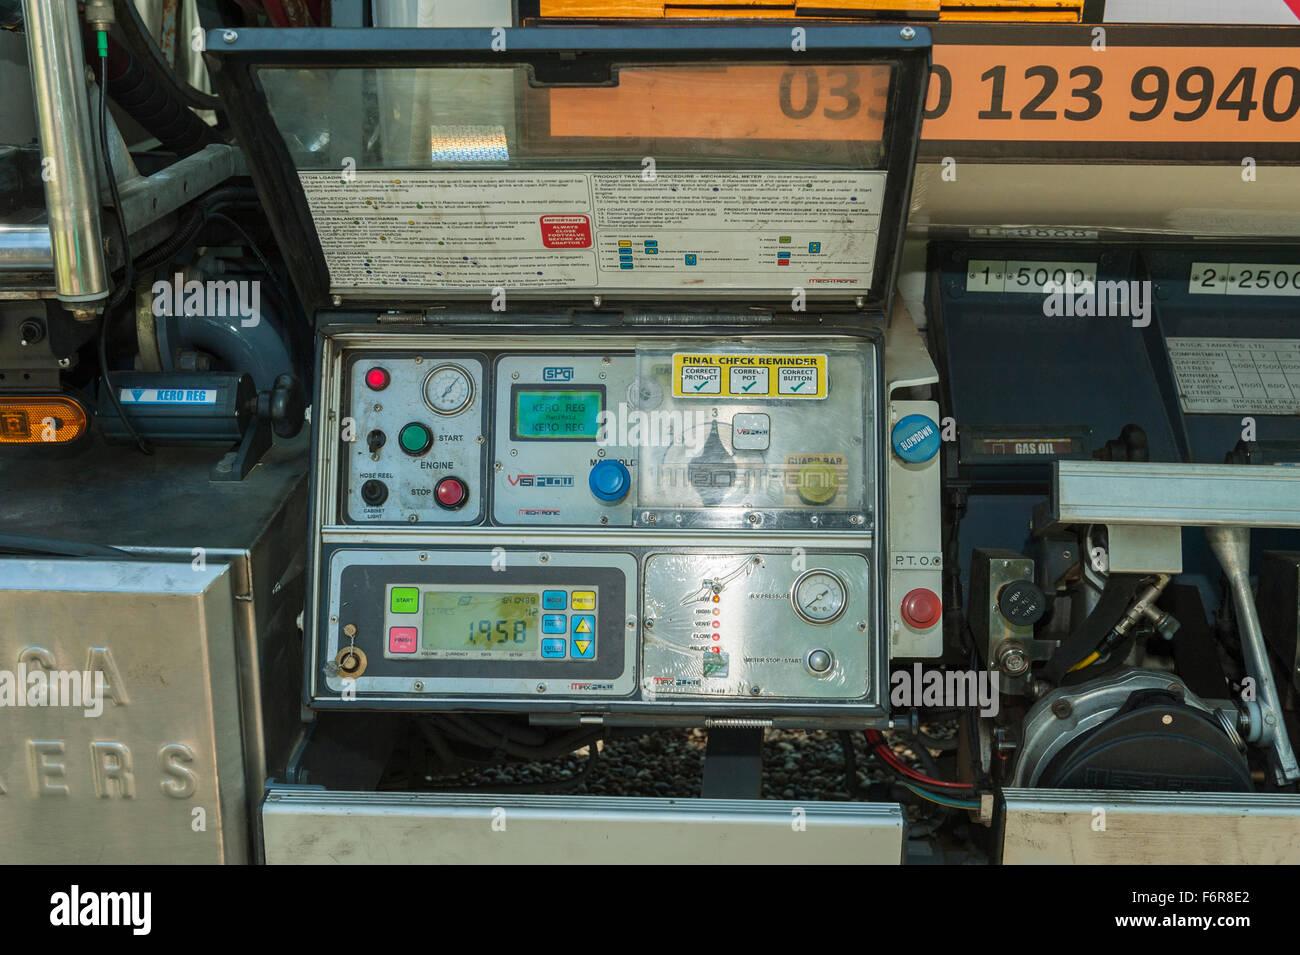 Heating Controls Stock Photos & Heating Controls Stock Images - Alamy